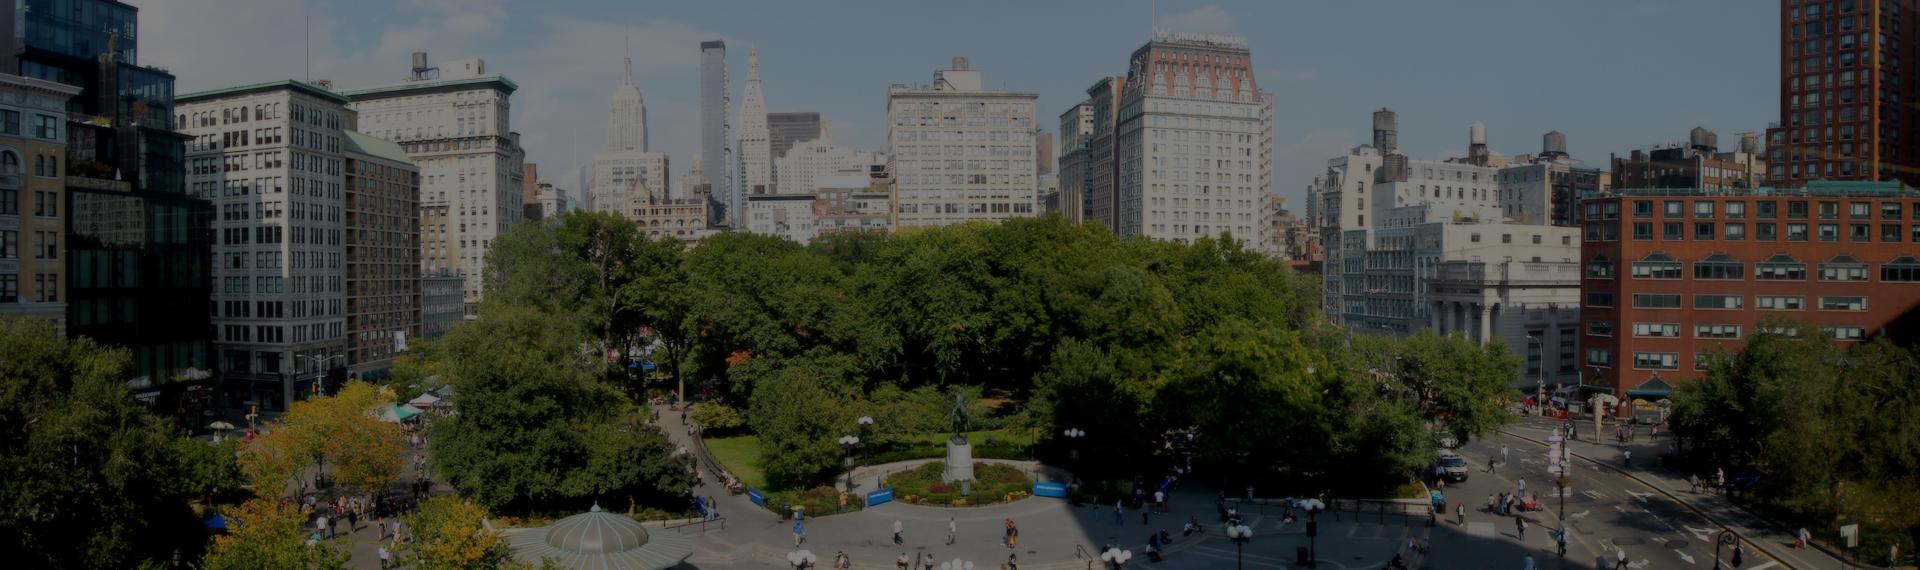 UMD Urgent Care NYC | Walk in Urgent Care New York